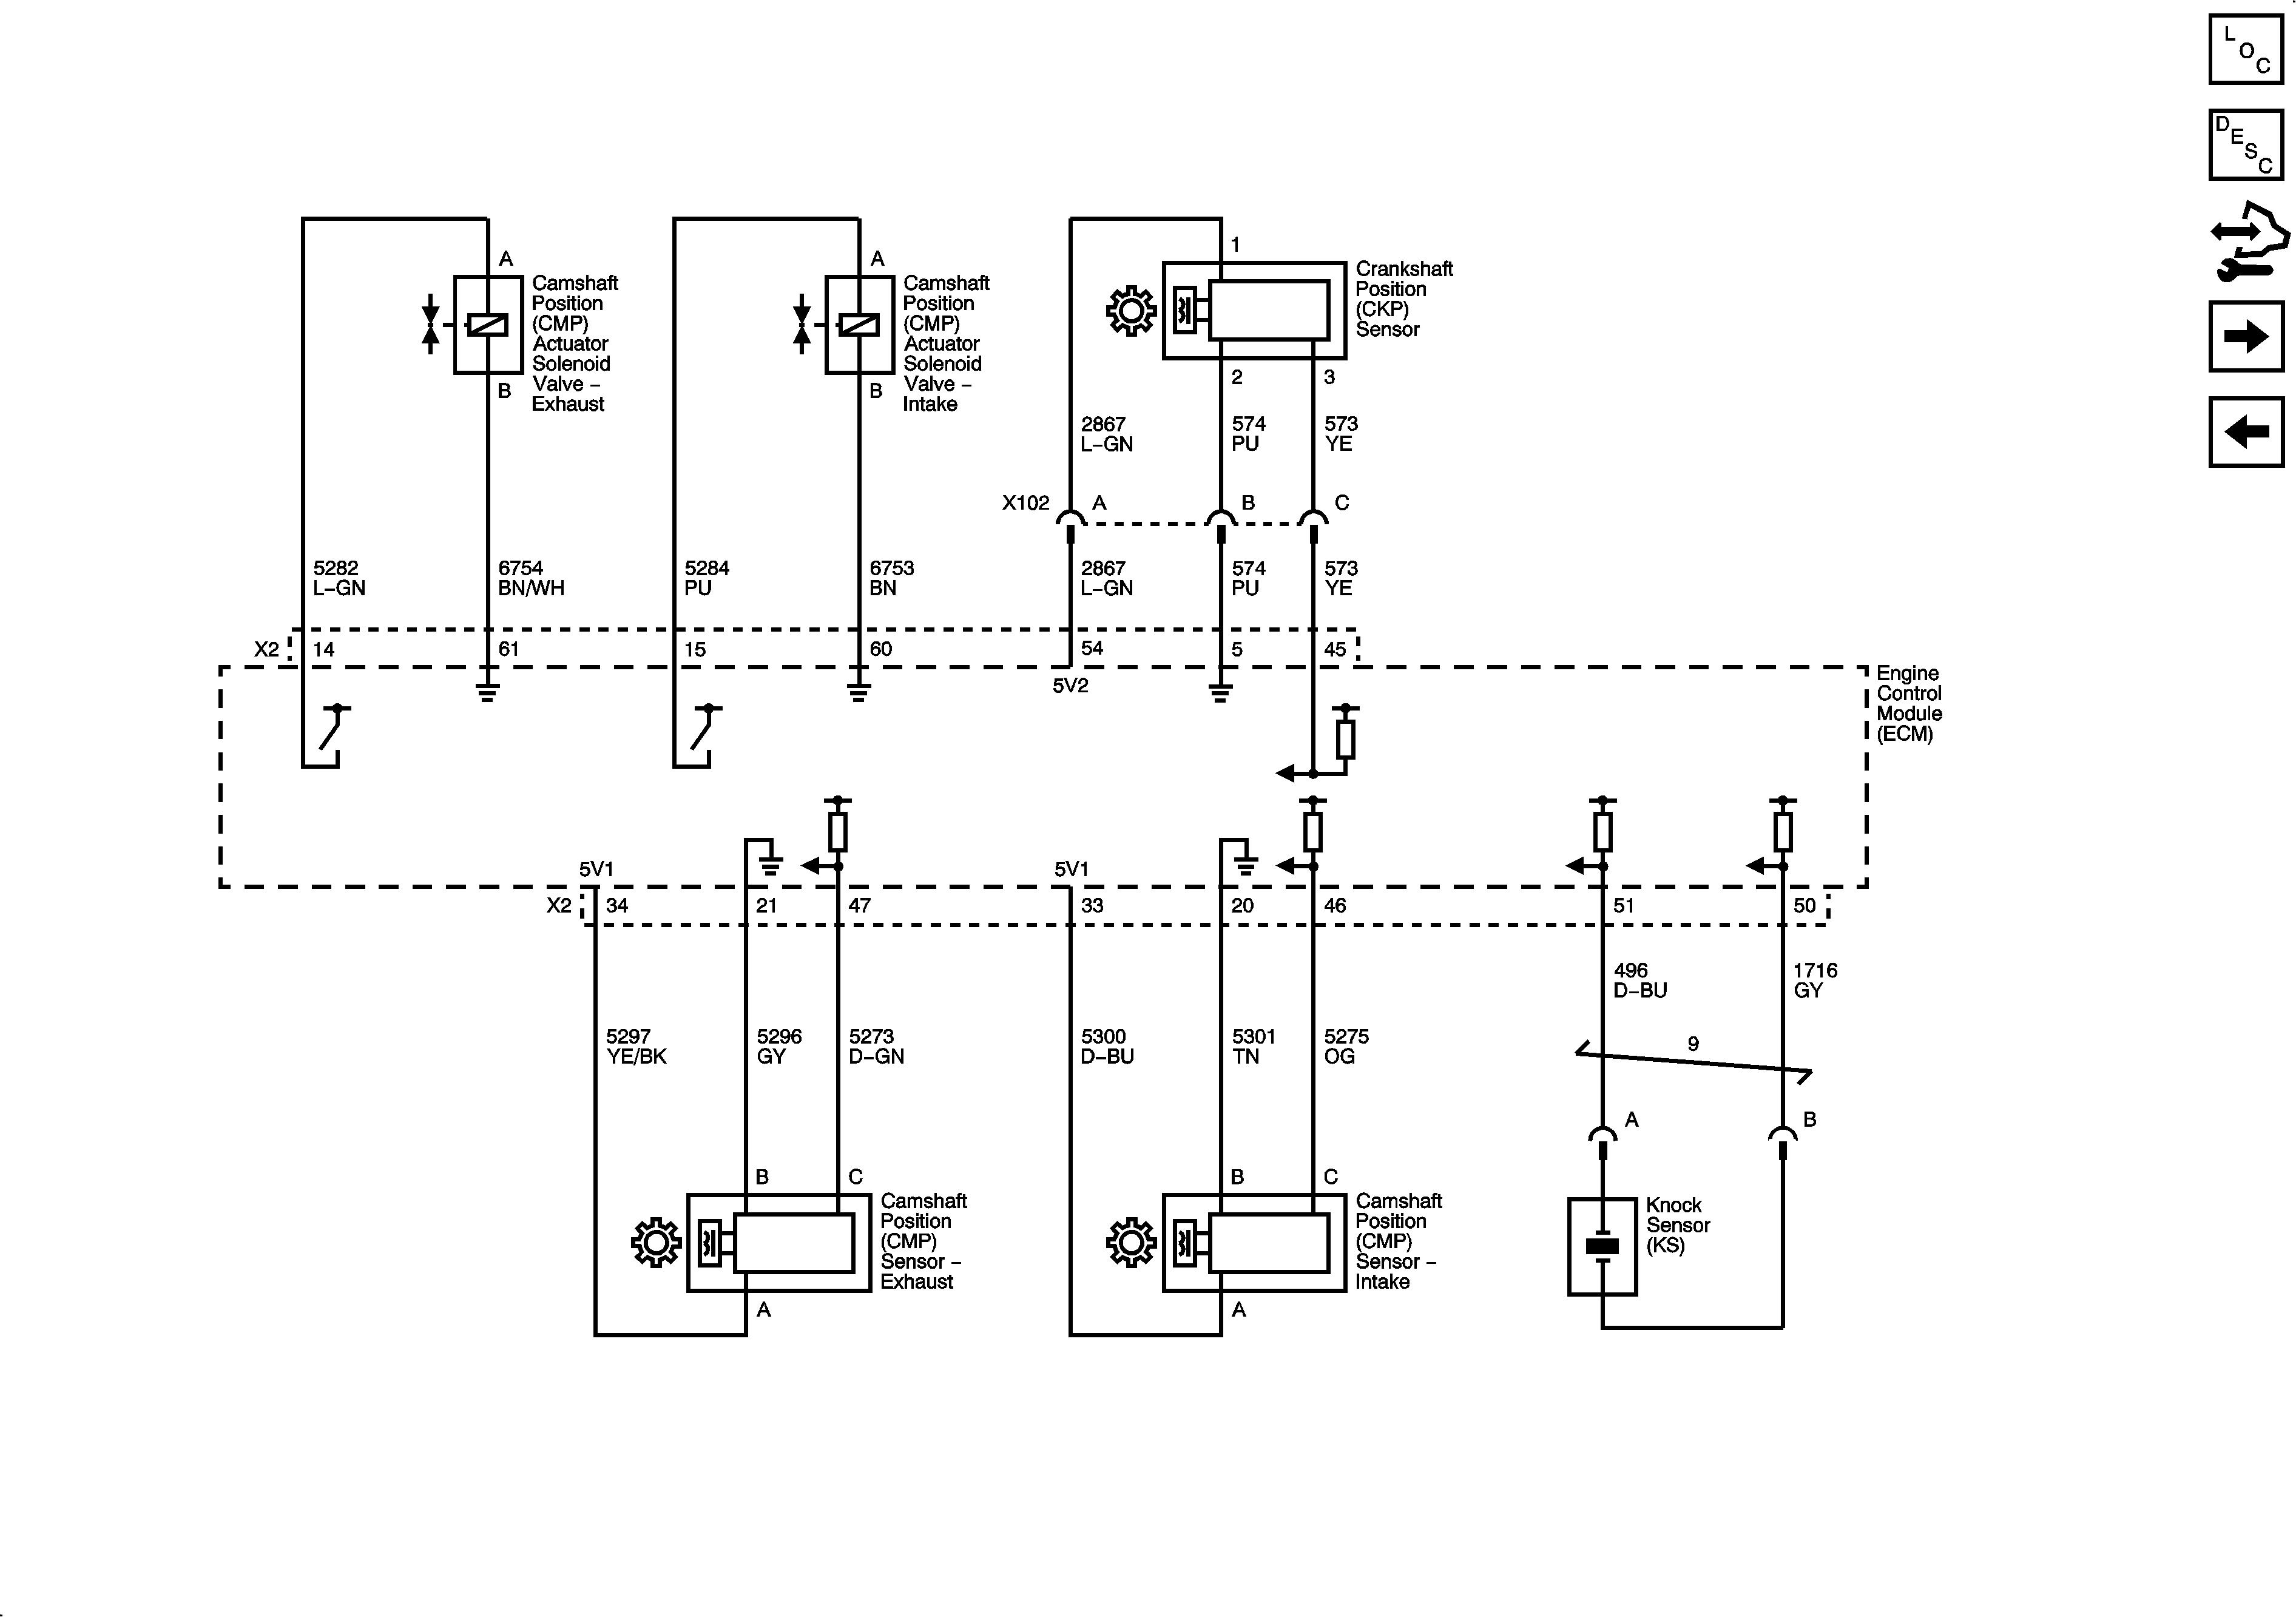 2008 pontiac g5 wire harness - 1957 chevy pickup wiring diagram -  rc85wirings.tukune.jeanjaures37.fr  wiring diagram resource